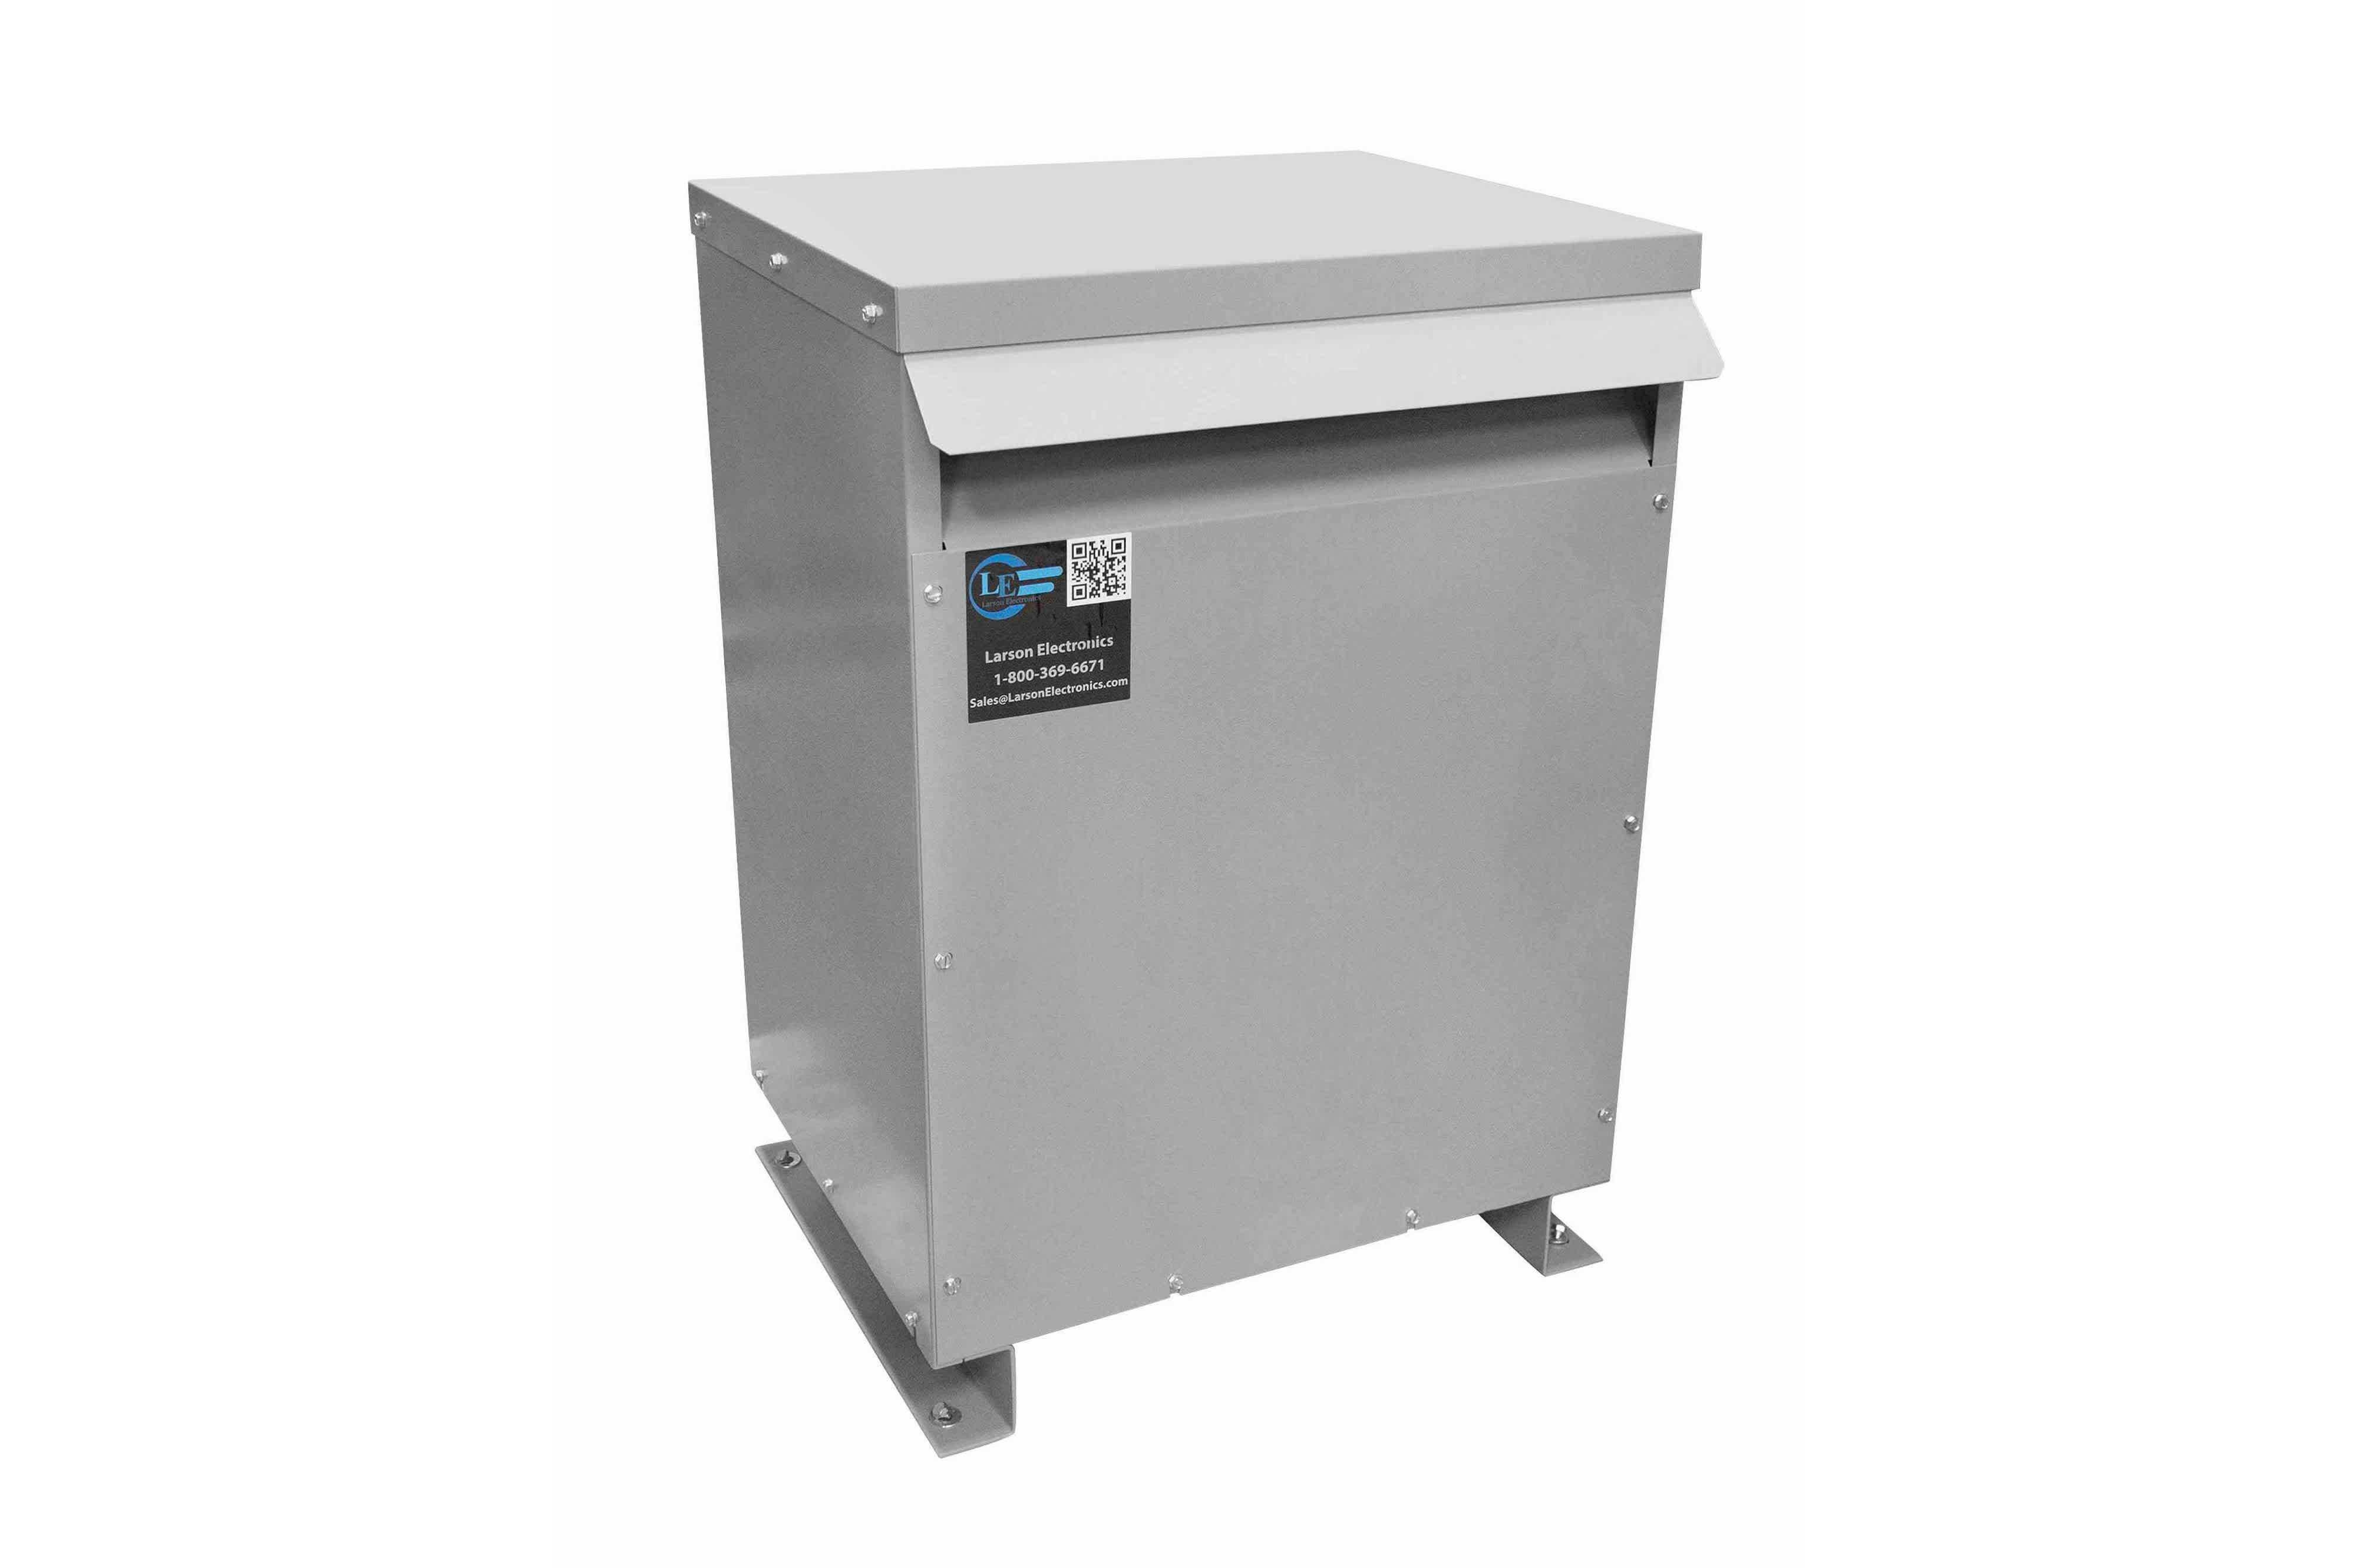 80 kVA 3PH Isolation Transformer, 480V Wye Primary, 575Y/332 Wye-N Secondary, N3R, Ventilated, 60 Hz